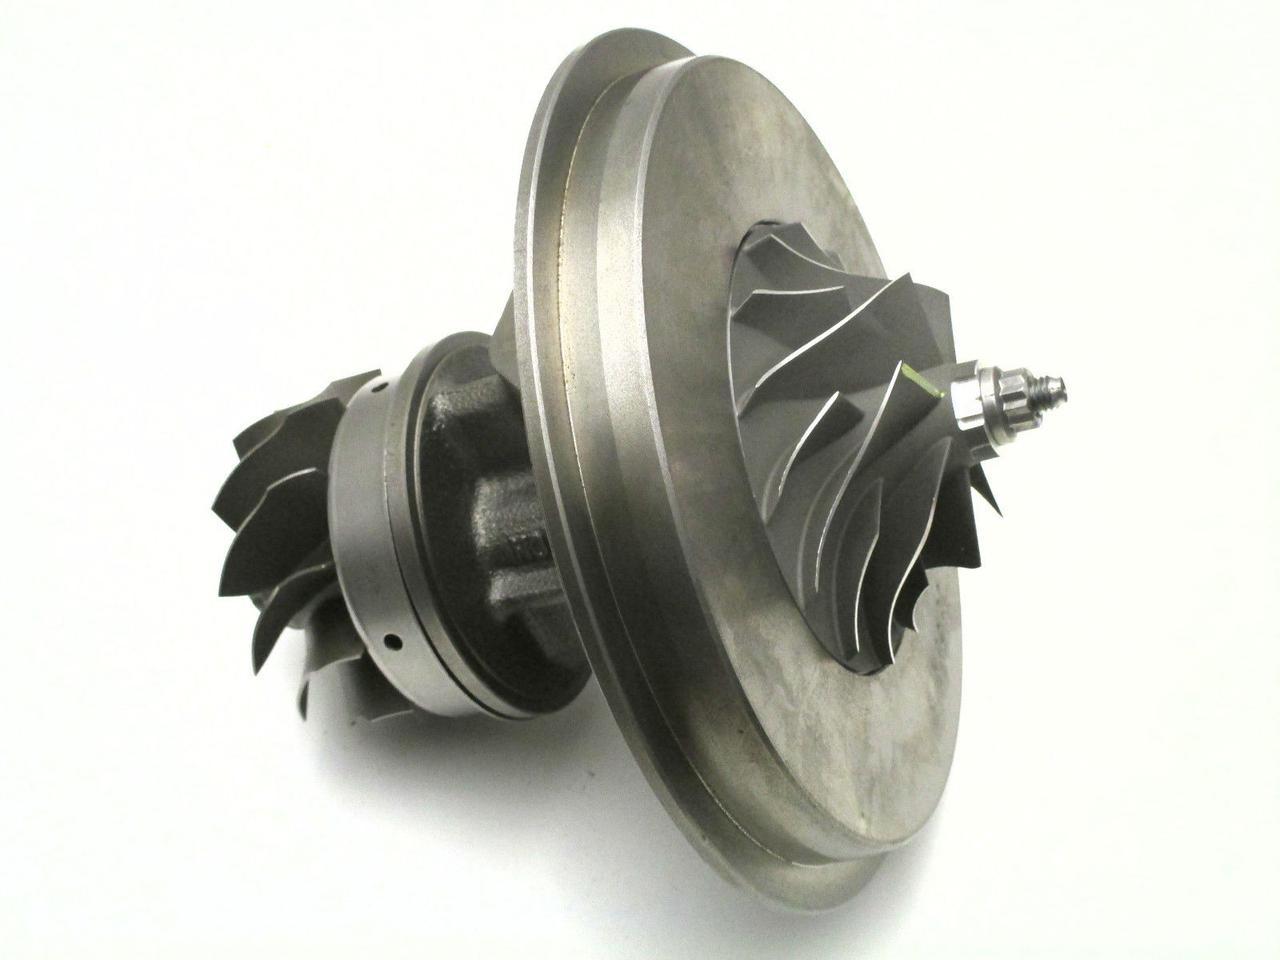 Картридж турбины Toyota Yaris/Corolla/Auris, D-4D, (2008-), 1,4D, 66/90